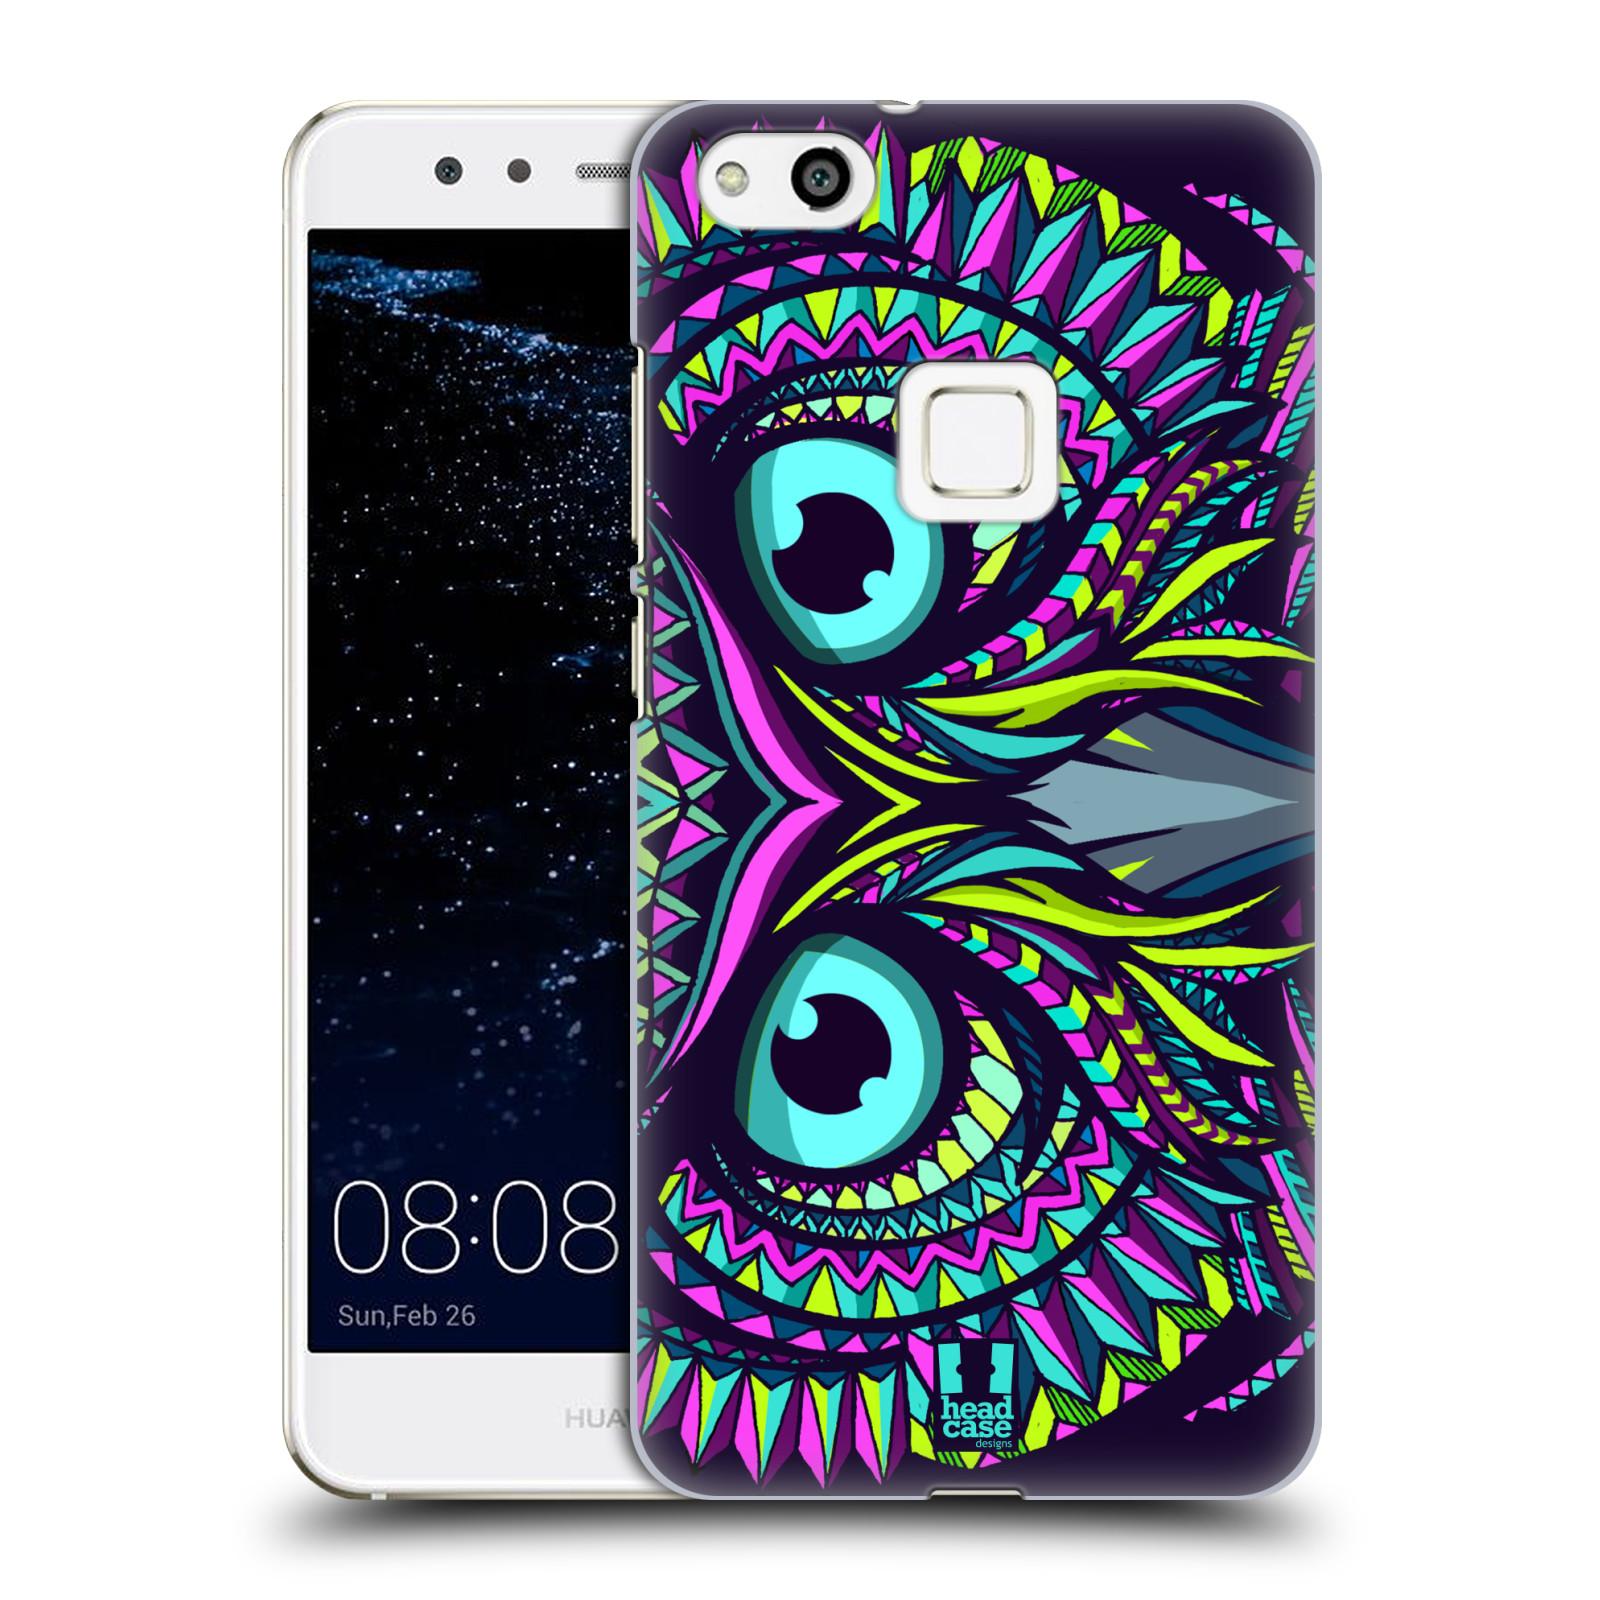 Plastové pouzdro na mobil Huawei P10 Lite Head Case - AZTEC SOVA (Plastový kryt či obal na mobilní telefon Huawei P10 Lite Dual SIM (LX1/LX1A))